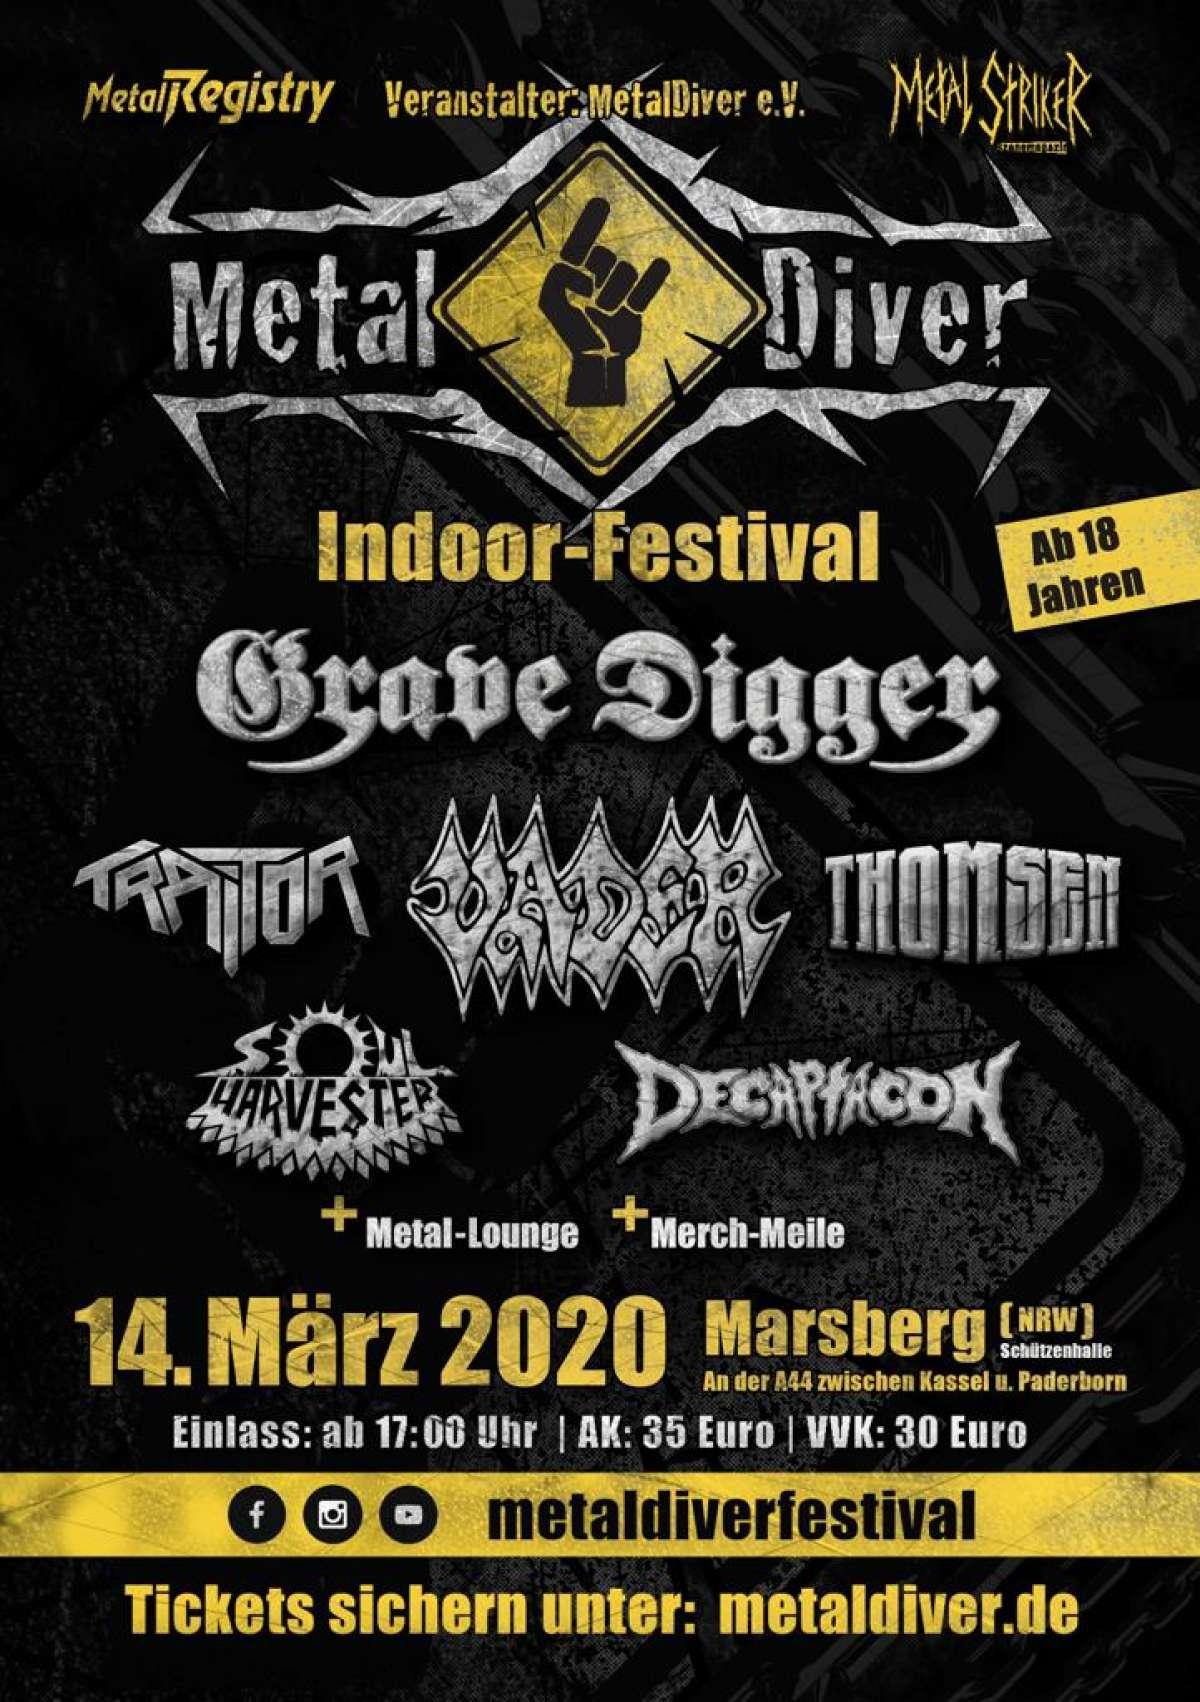 Metal Diver 2021 - Grave Digger, Vader, u.a. - Schützenhalle  - Marsberg